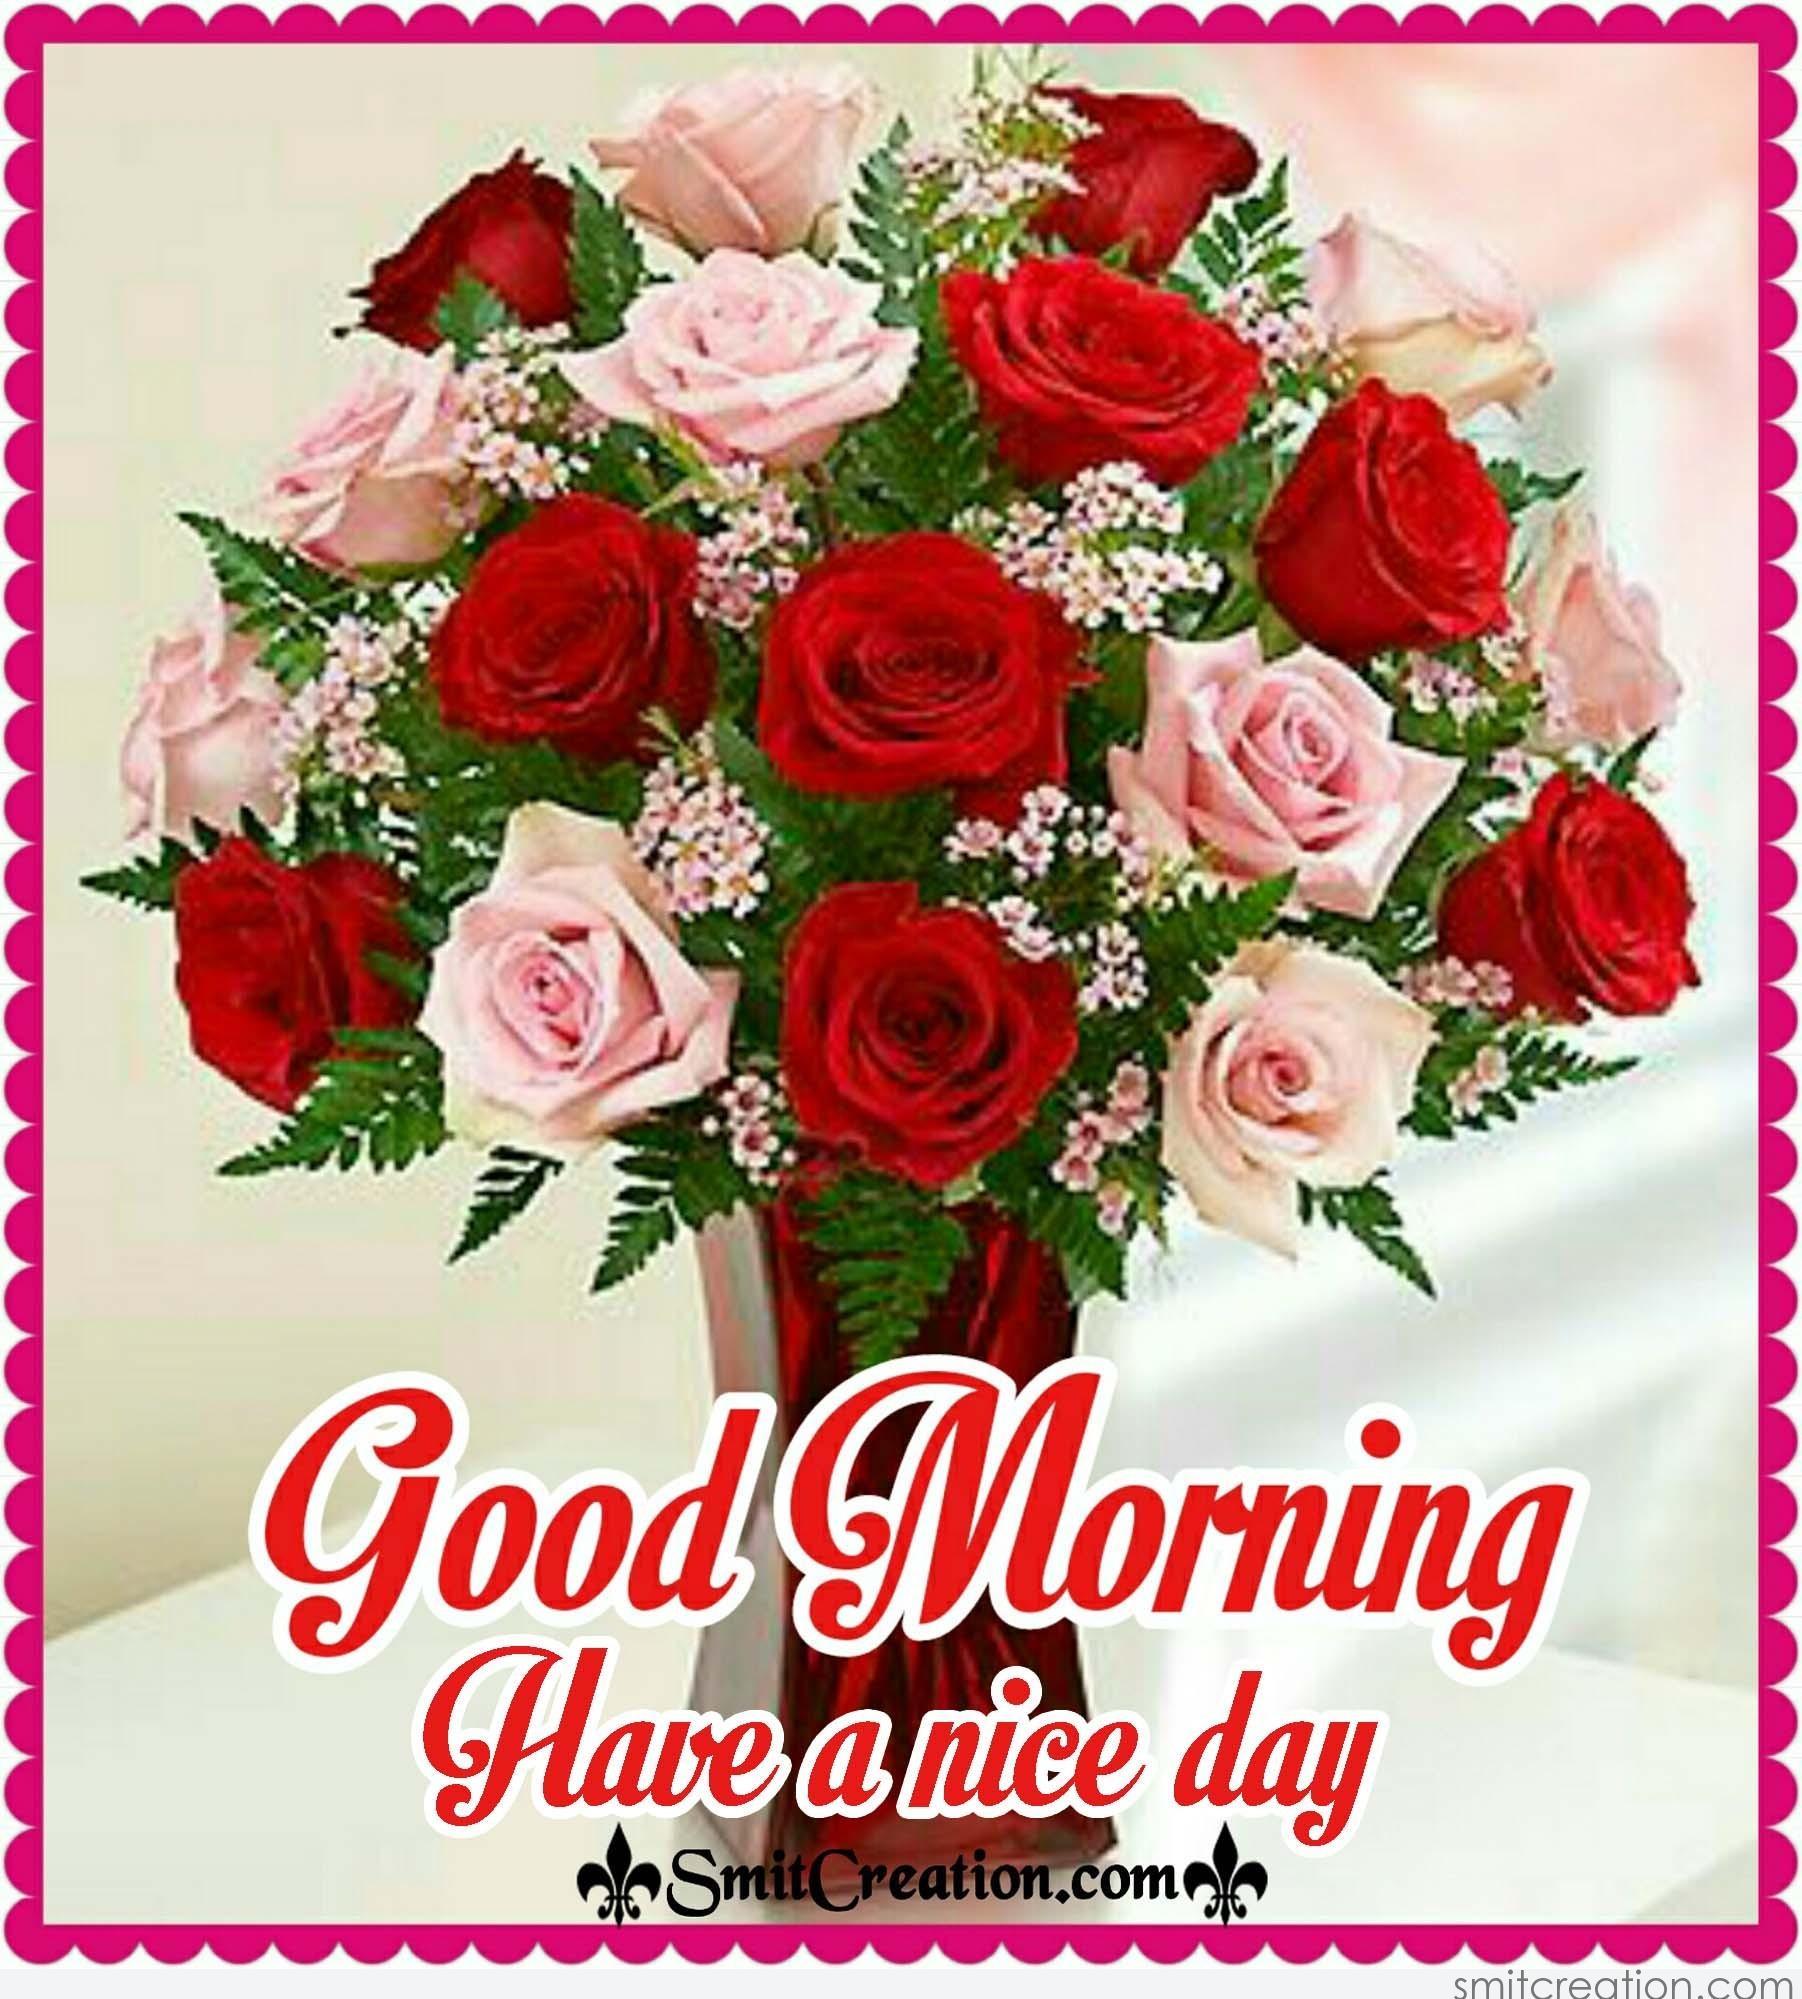 Good Morning Have A Nice Day Smitcreation Com